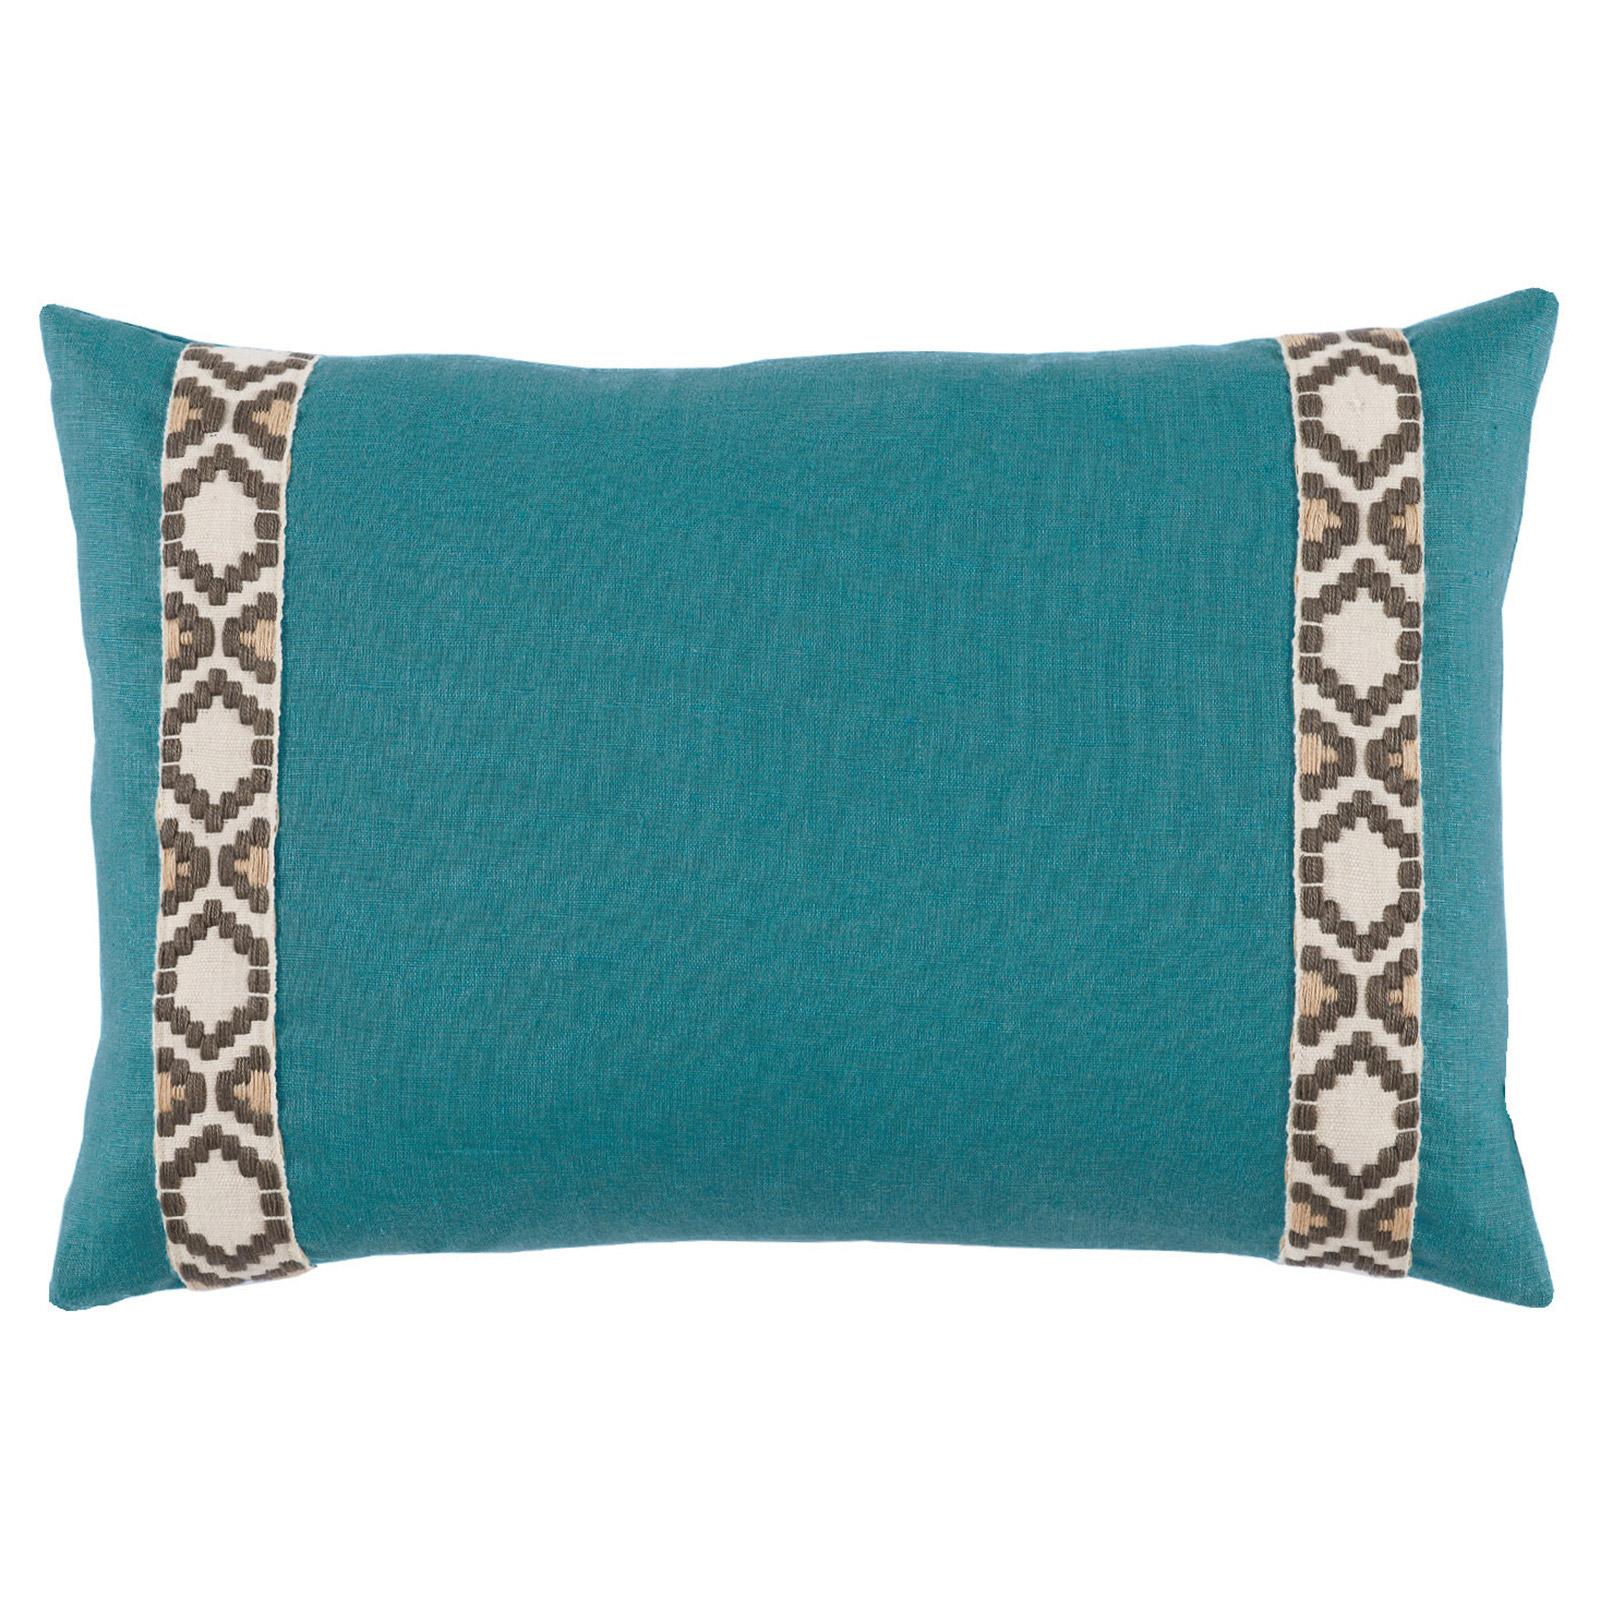 Kaia Global Deep Teal Linen Trim Band Pillow - 13x19